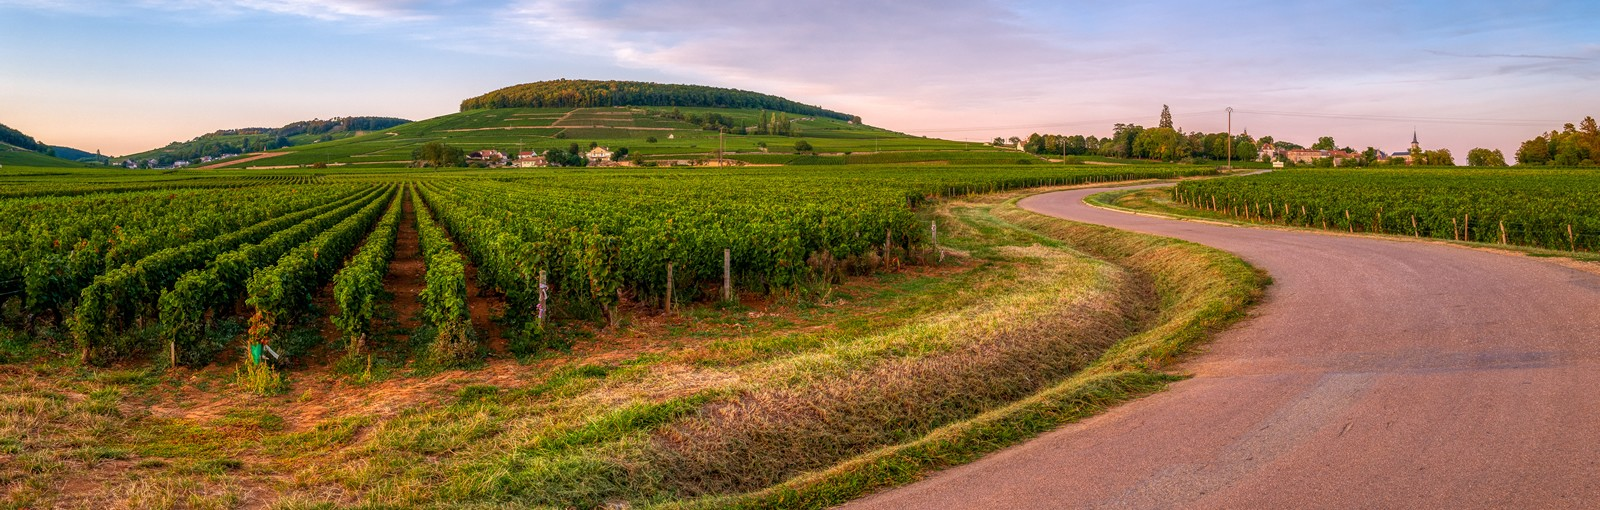 Bourgogne - La Route des Grands Crus